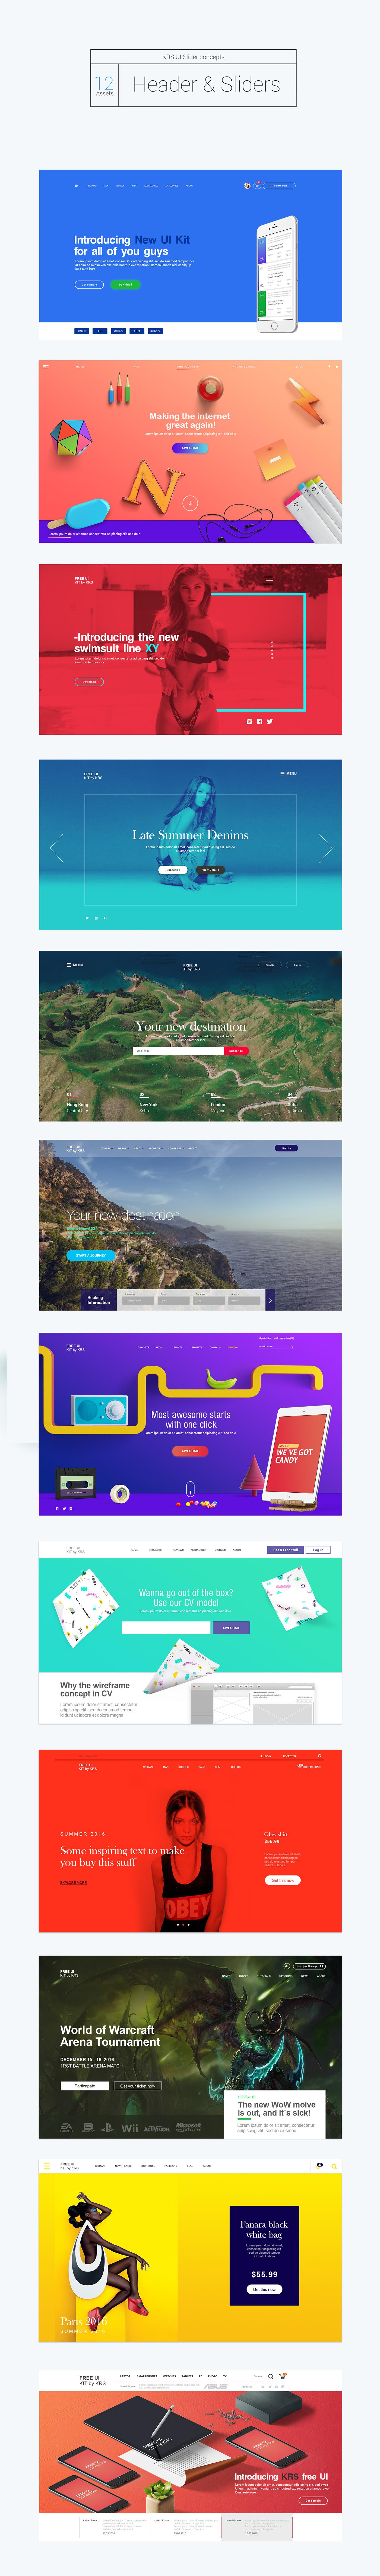 ui kit UI ux adobe free flat Ecommerce KRS shop KRS design